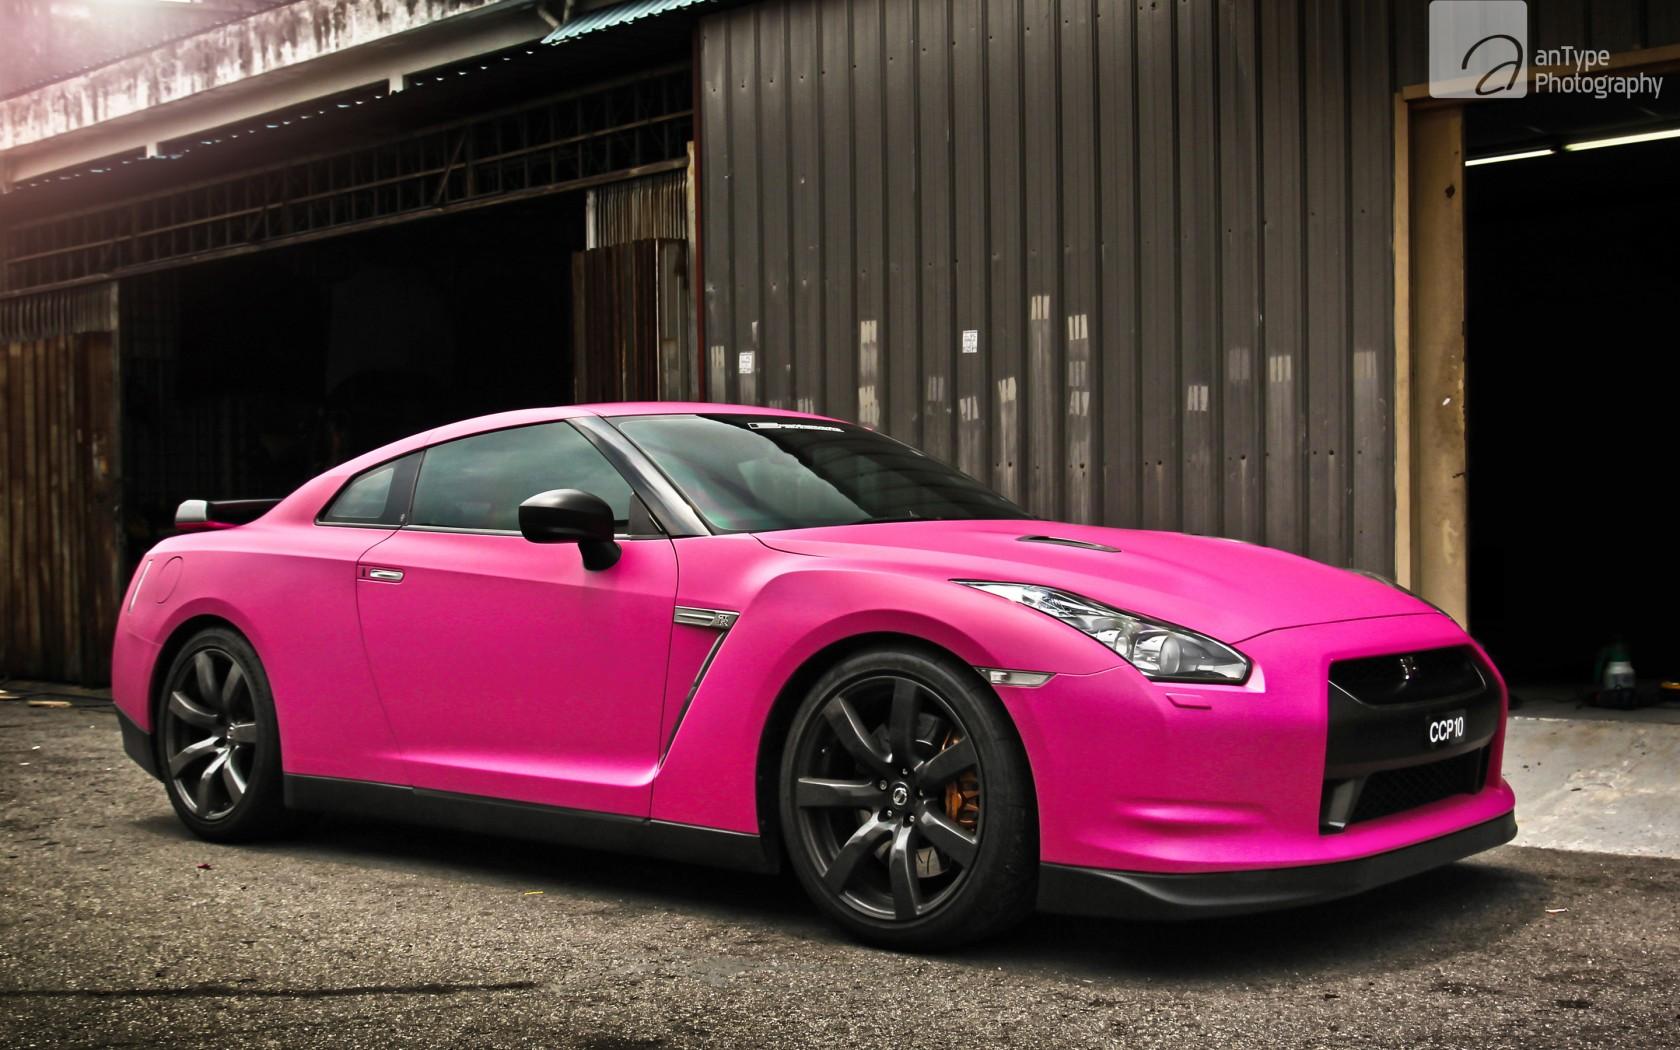 Pink Nissan Gtr Wallpaper Hd Car Wallpapers Id 2975